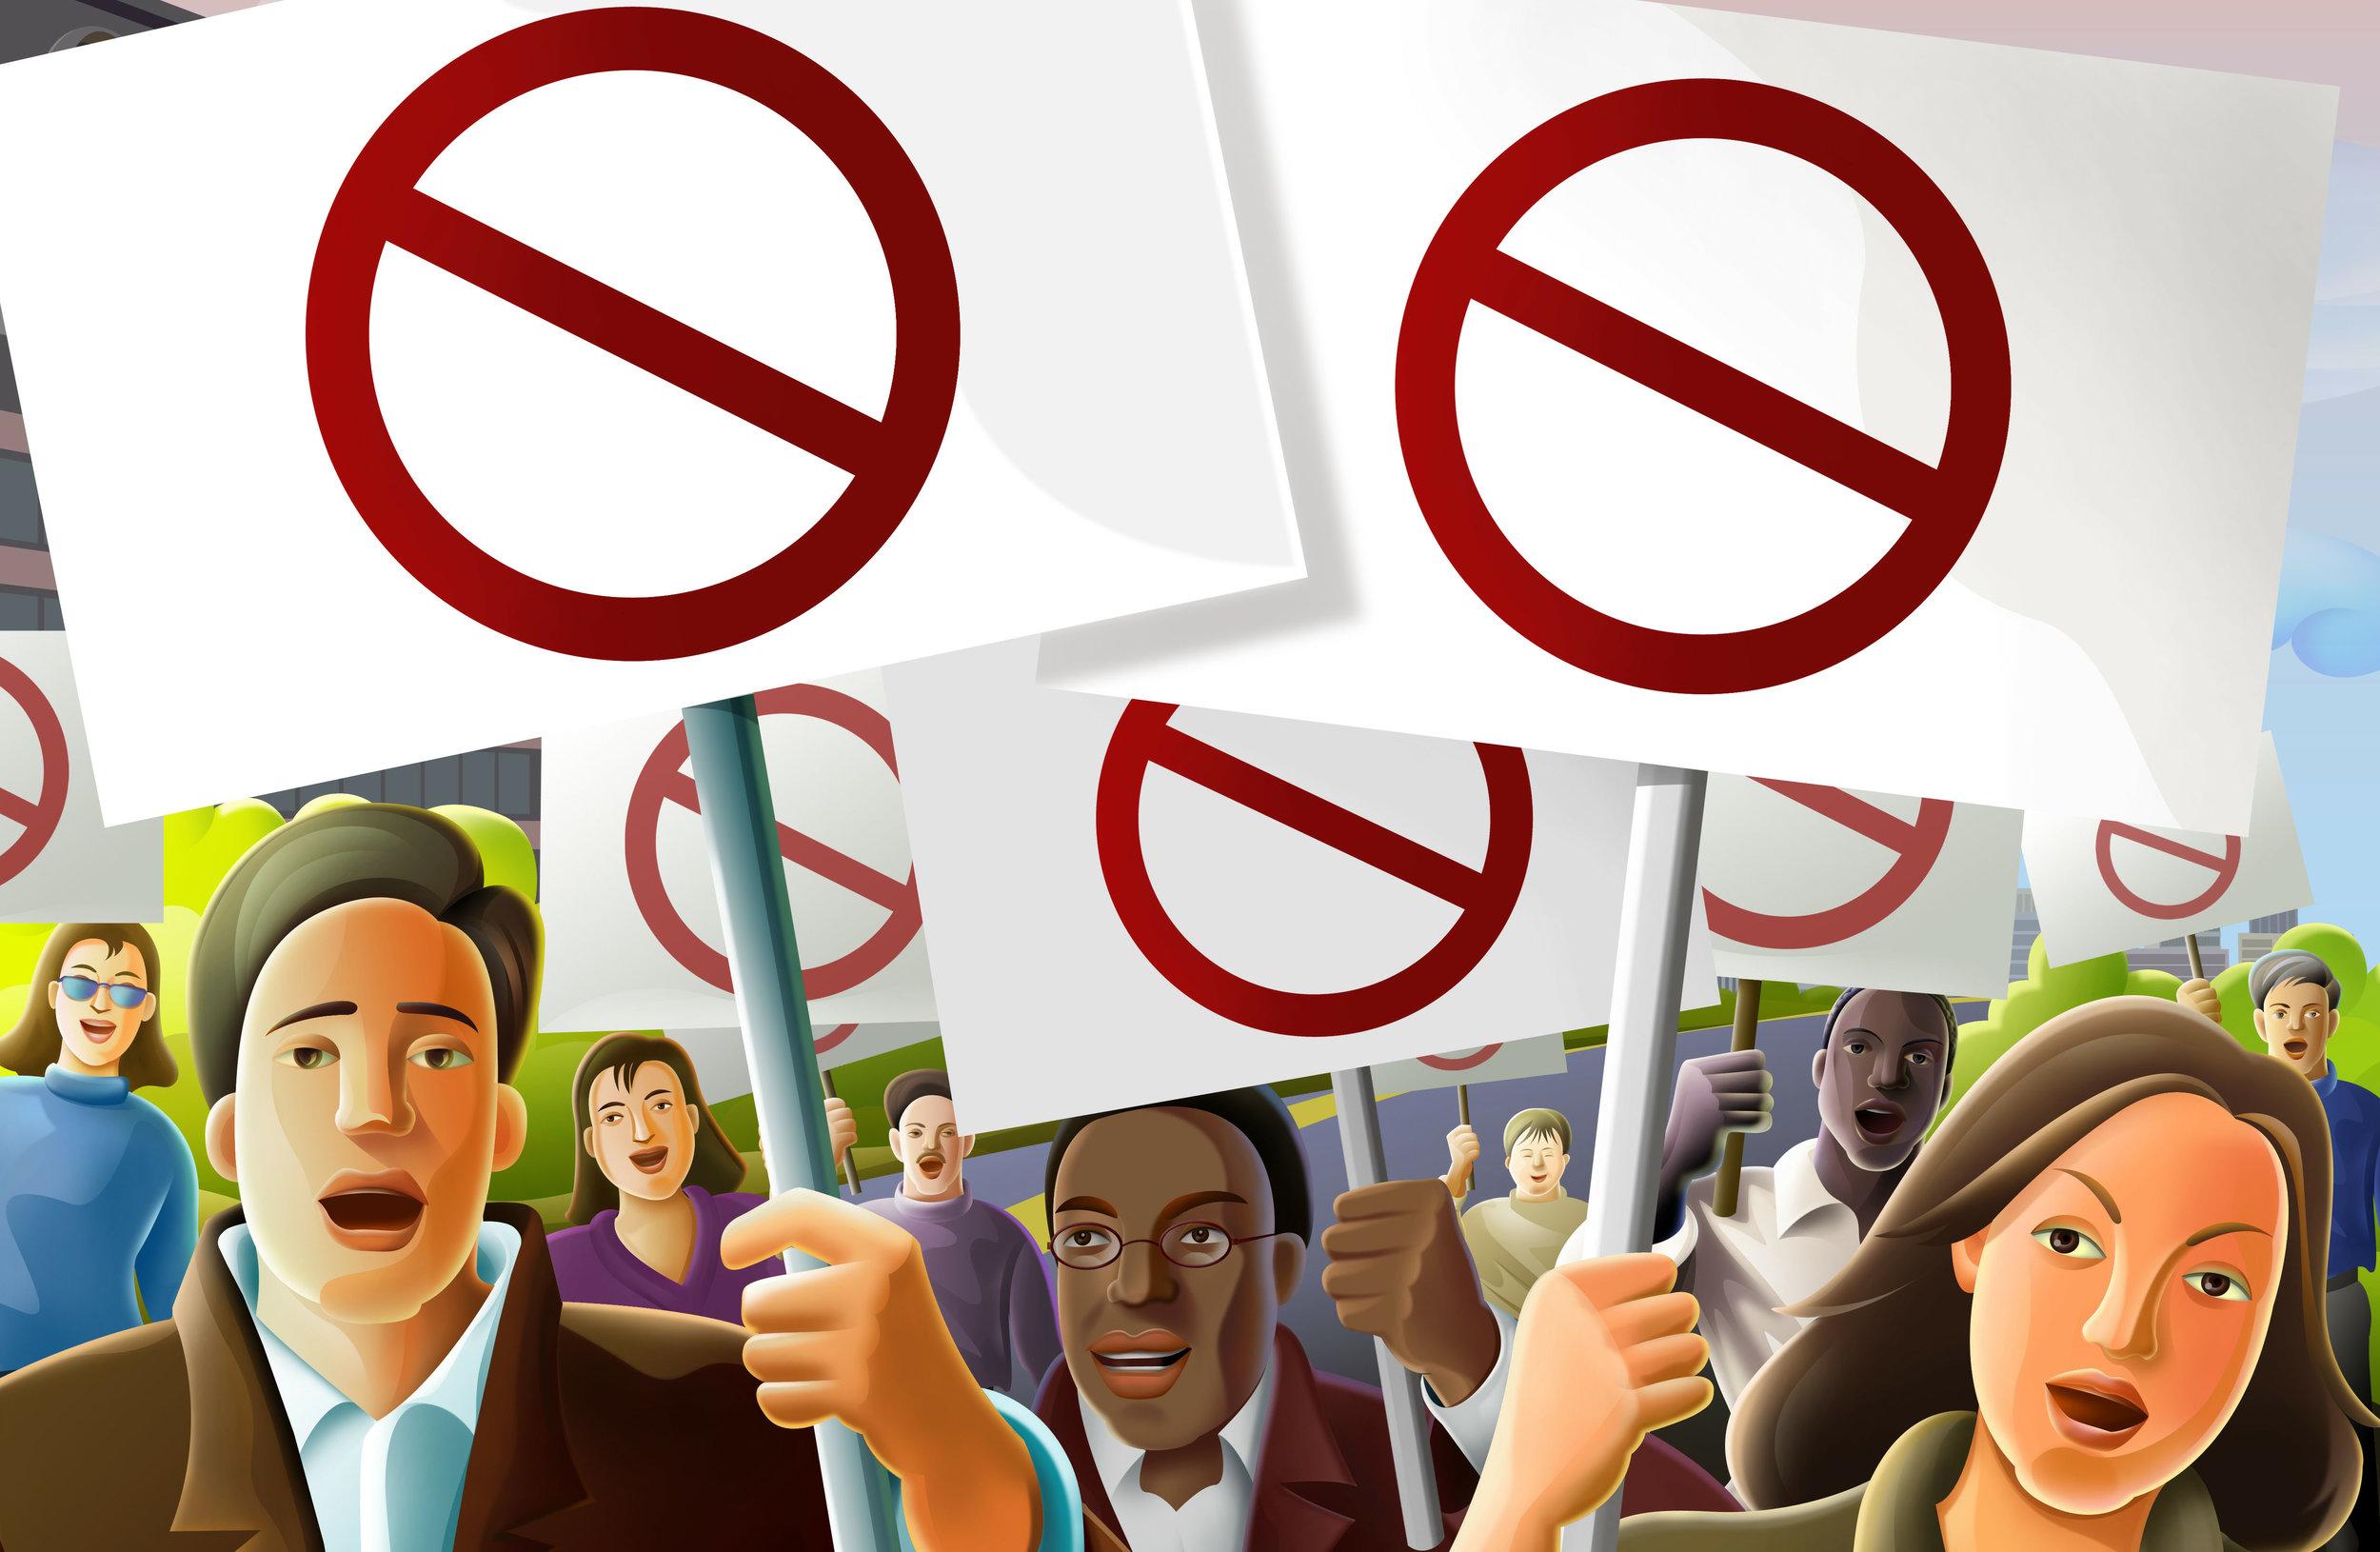 Ban Signs.jpg